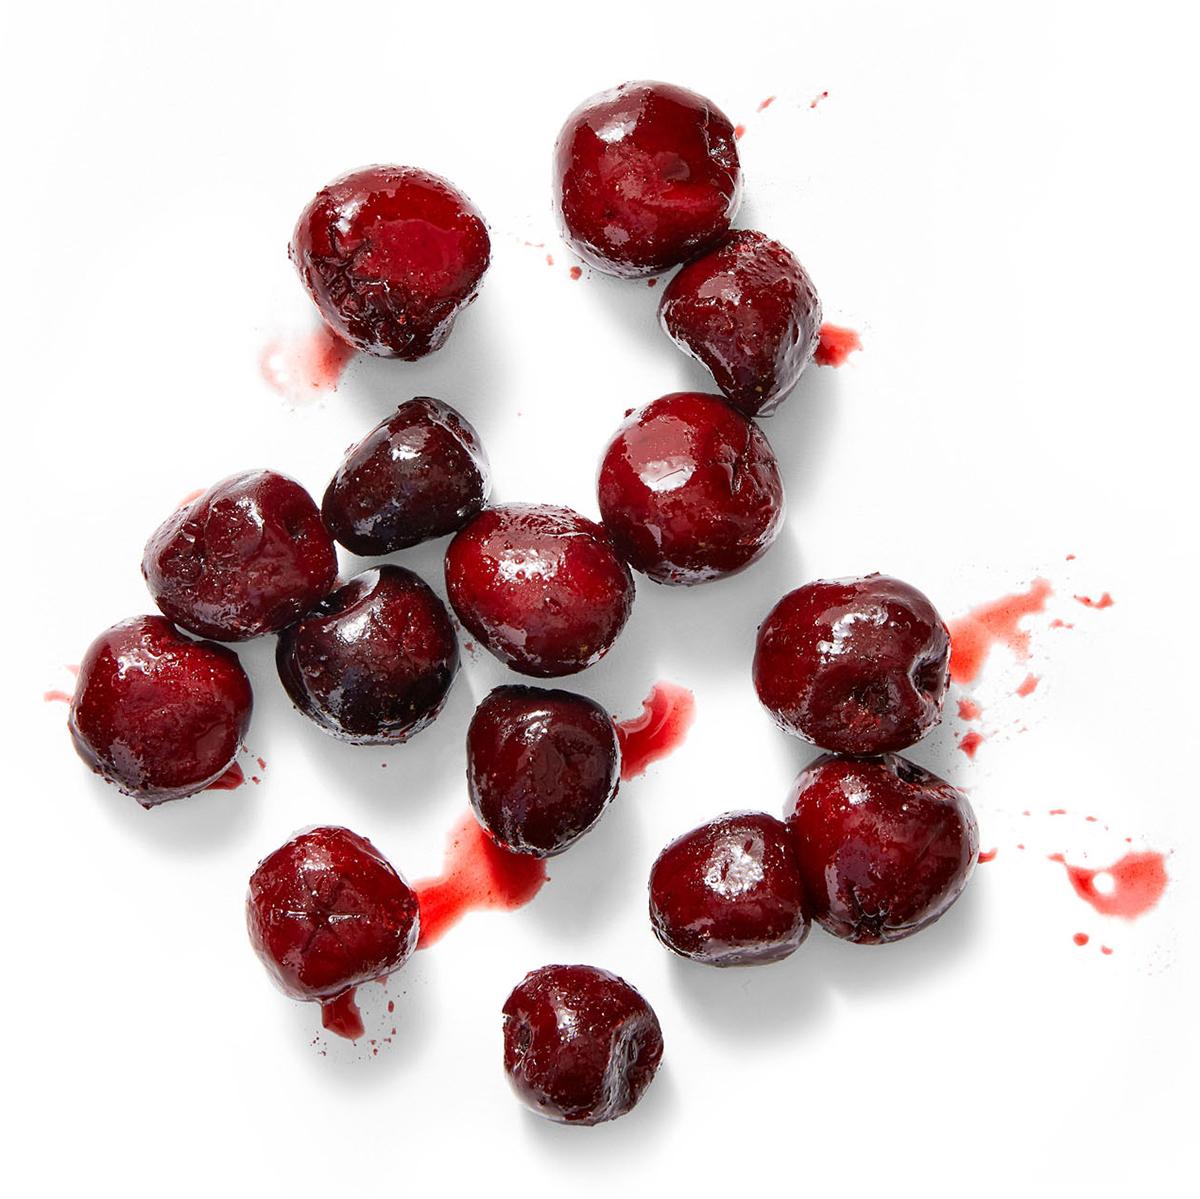 frozen cherries on white surface